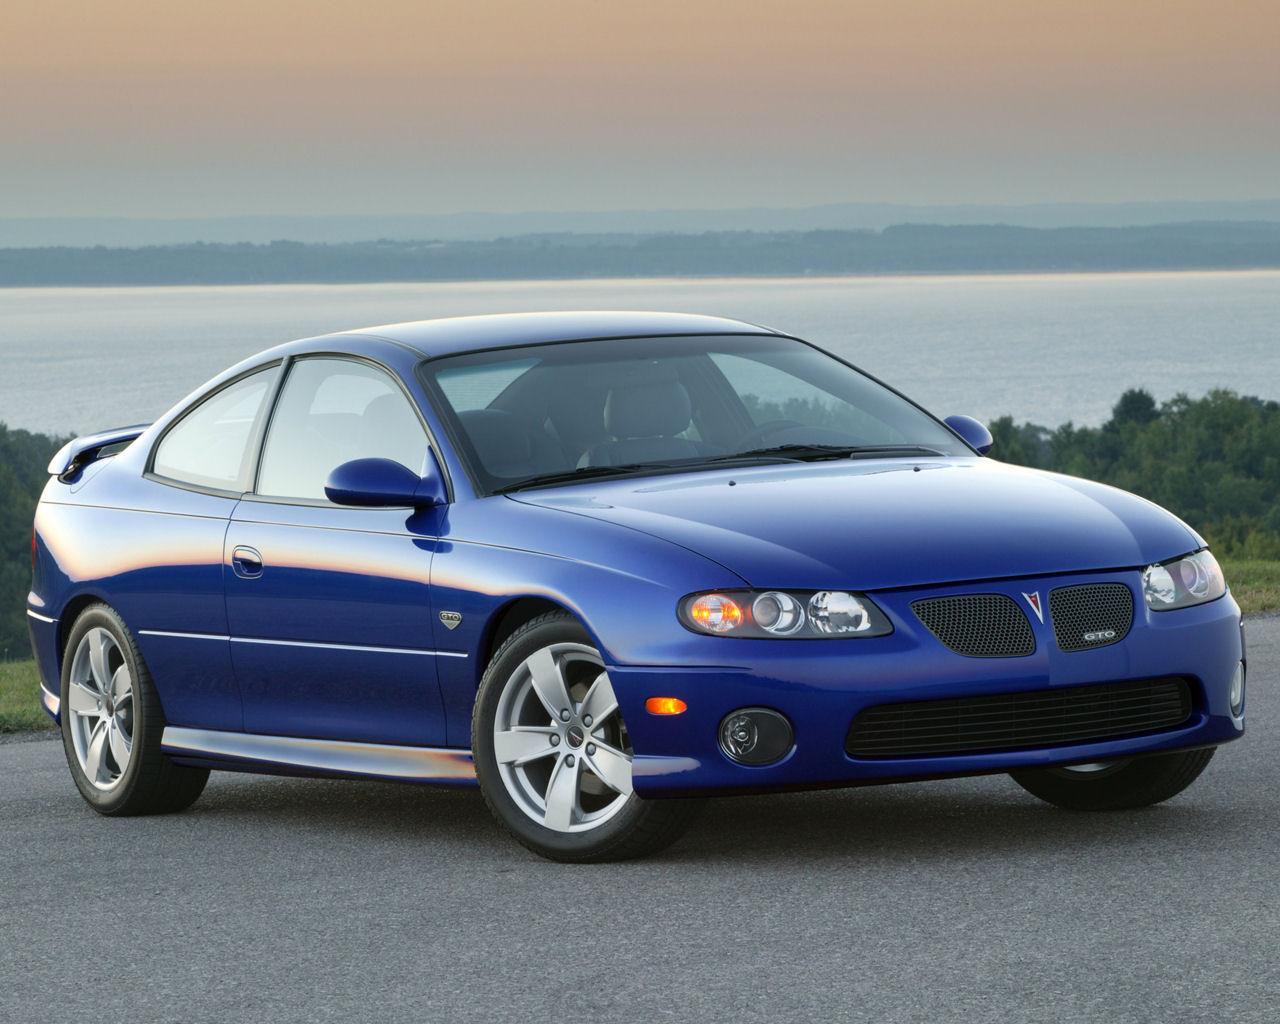 Pontiac GTO Coupe 57 V8   1280x1024 Wallpaper 1280x1024